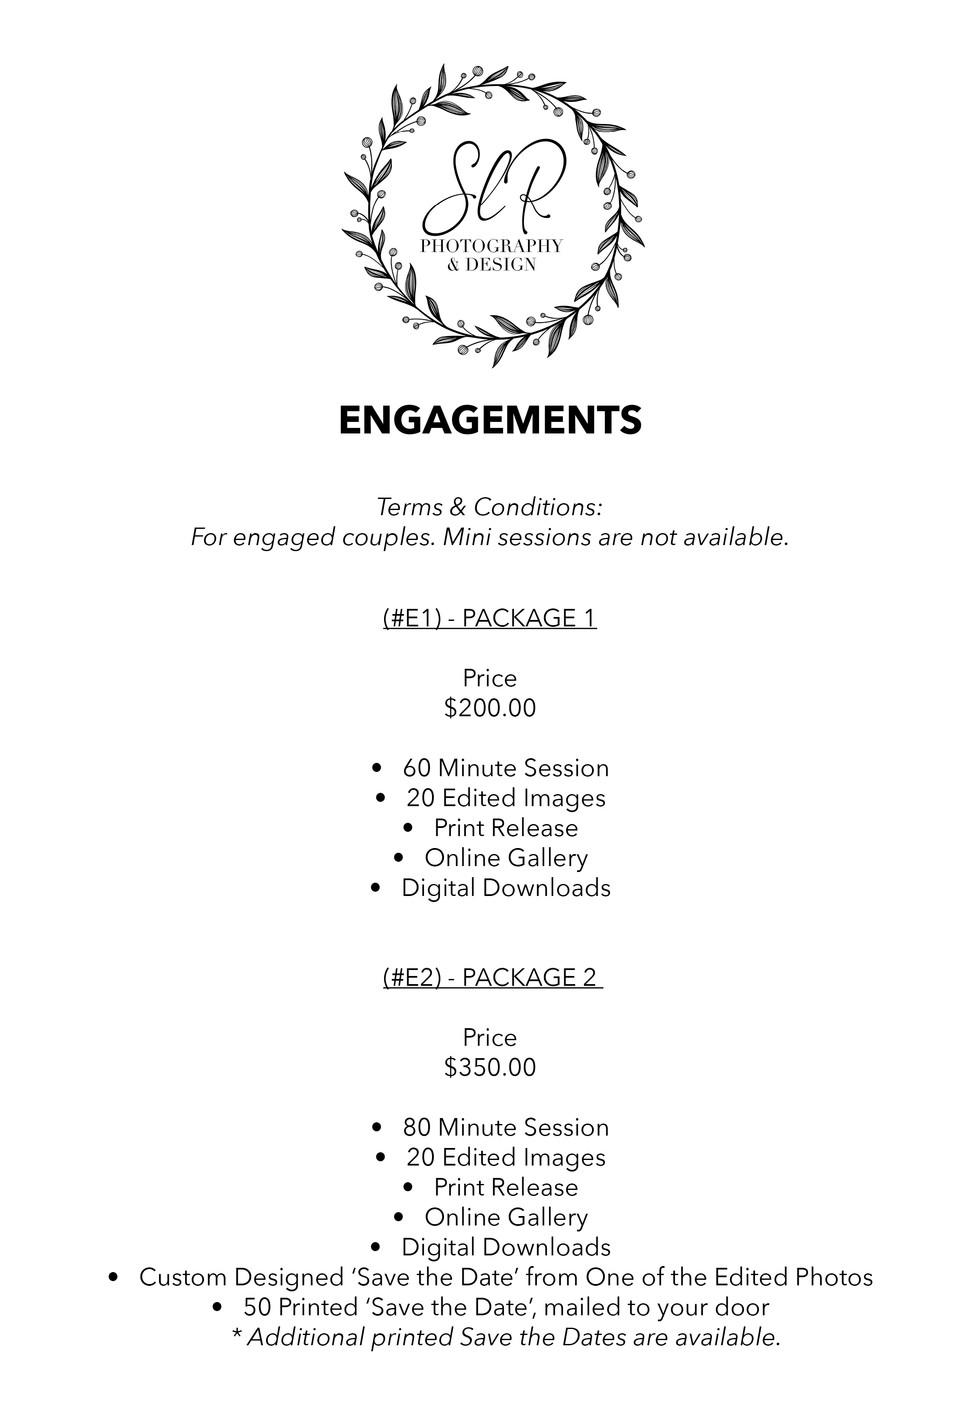 SLR Photography & Design price sheet -6.